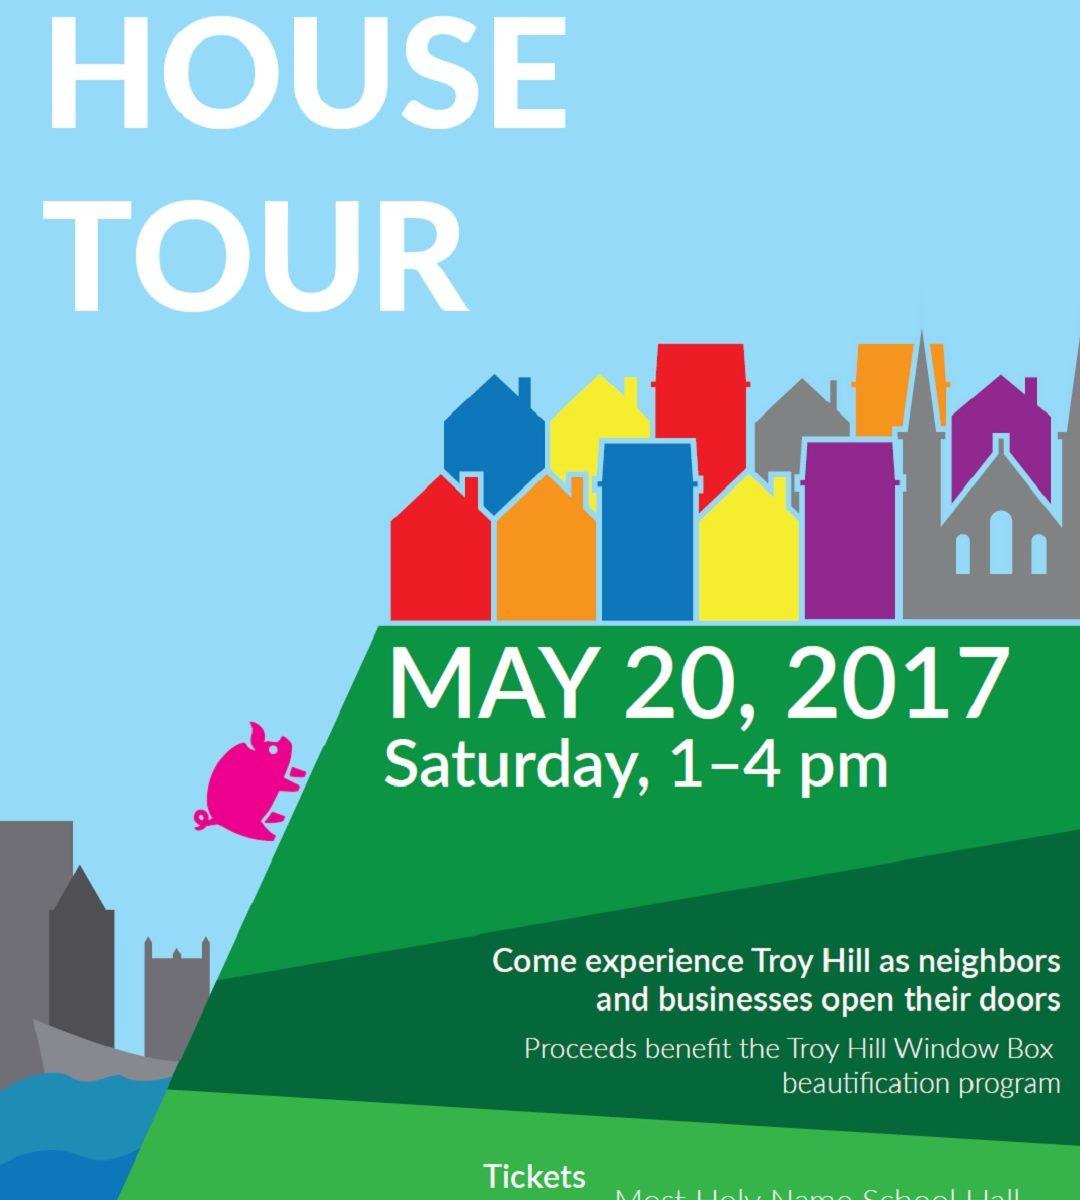 House Tour Ticket Flyer 2017